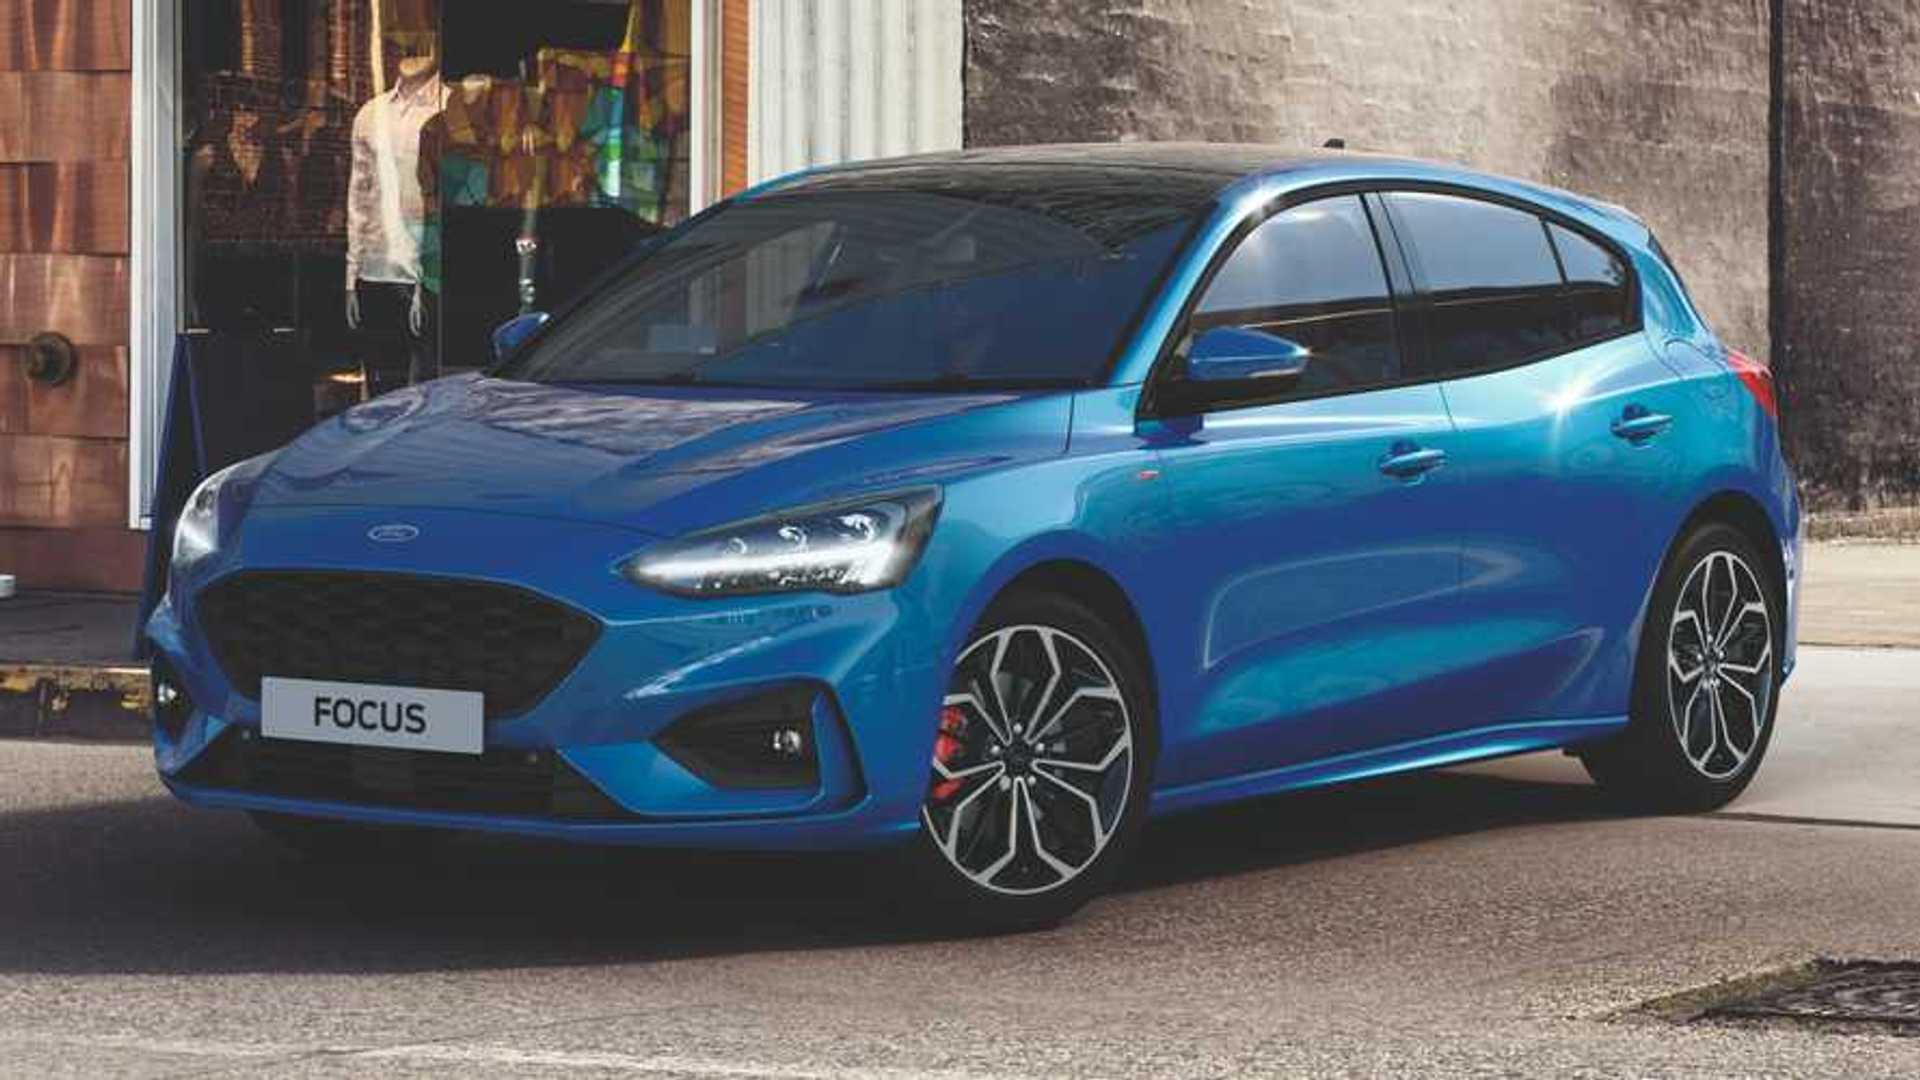 Ford Focus Ecoboost Hybrid Debuts With Mhev Tech Digital Dash News Akmi